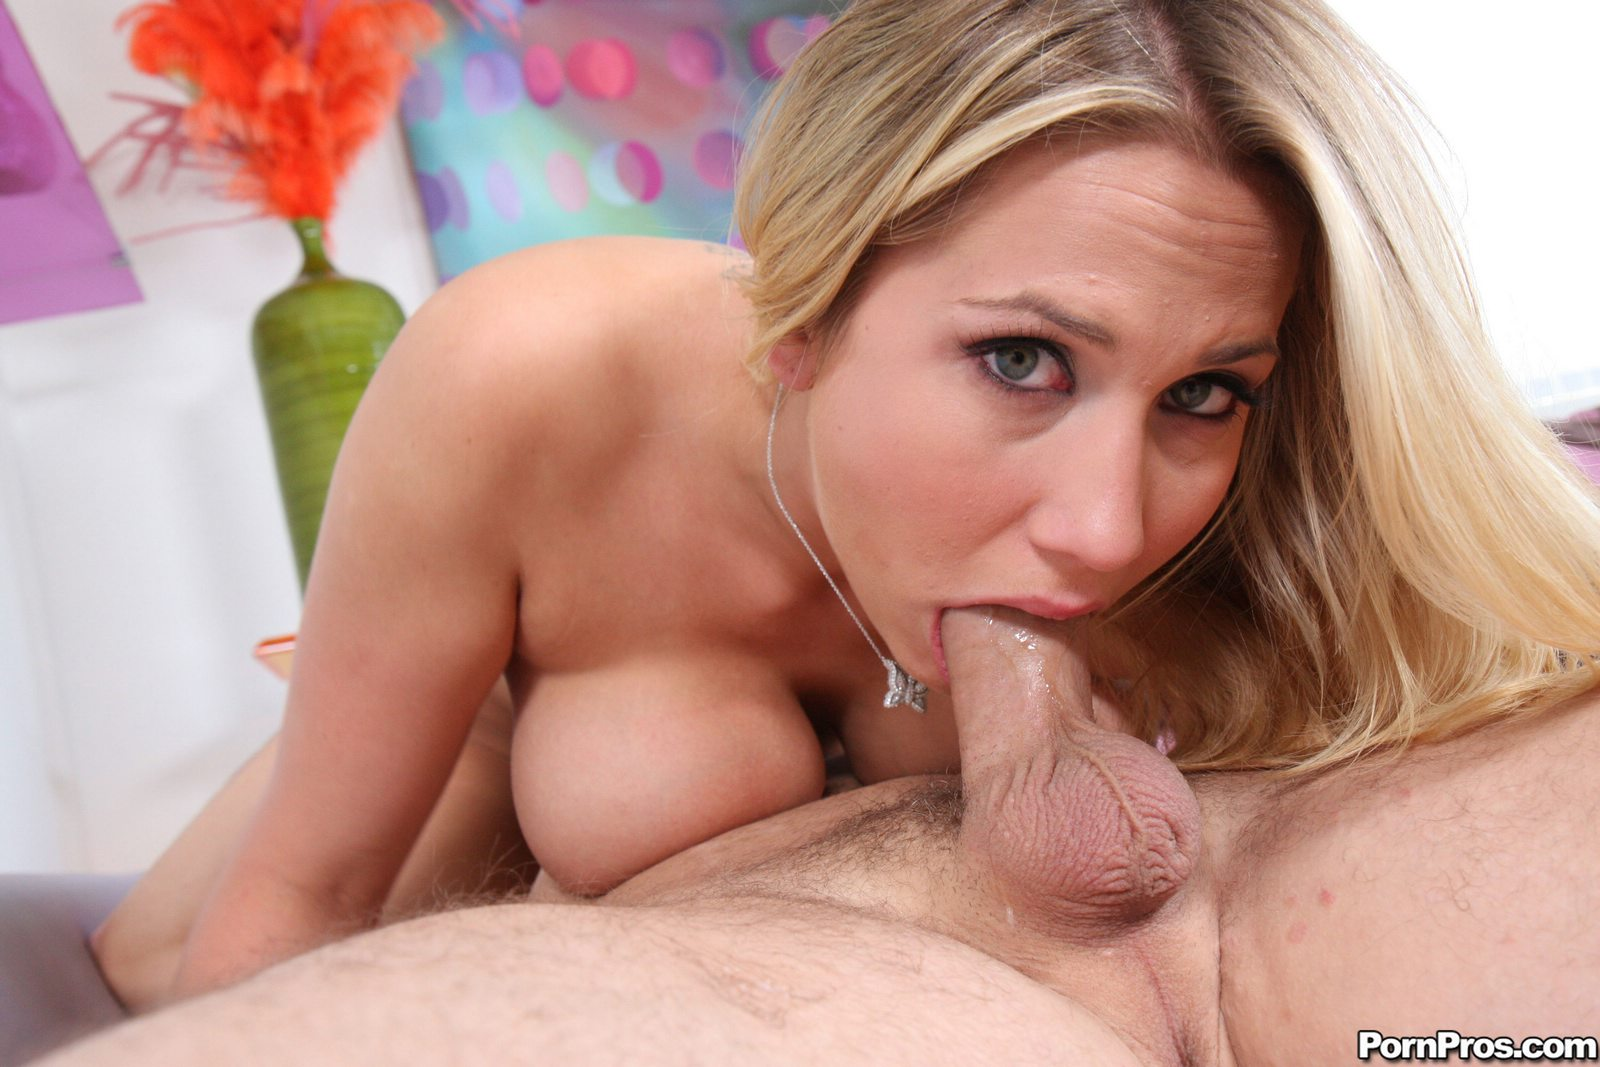 Quality porn Dick mature ass sucks tight